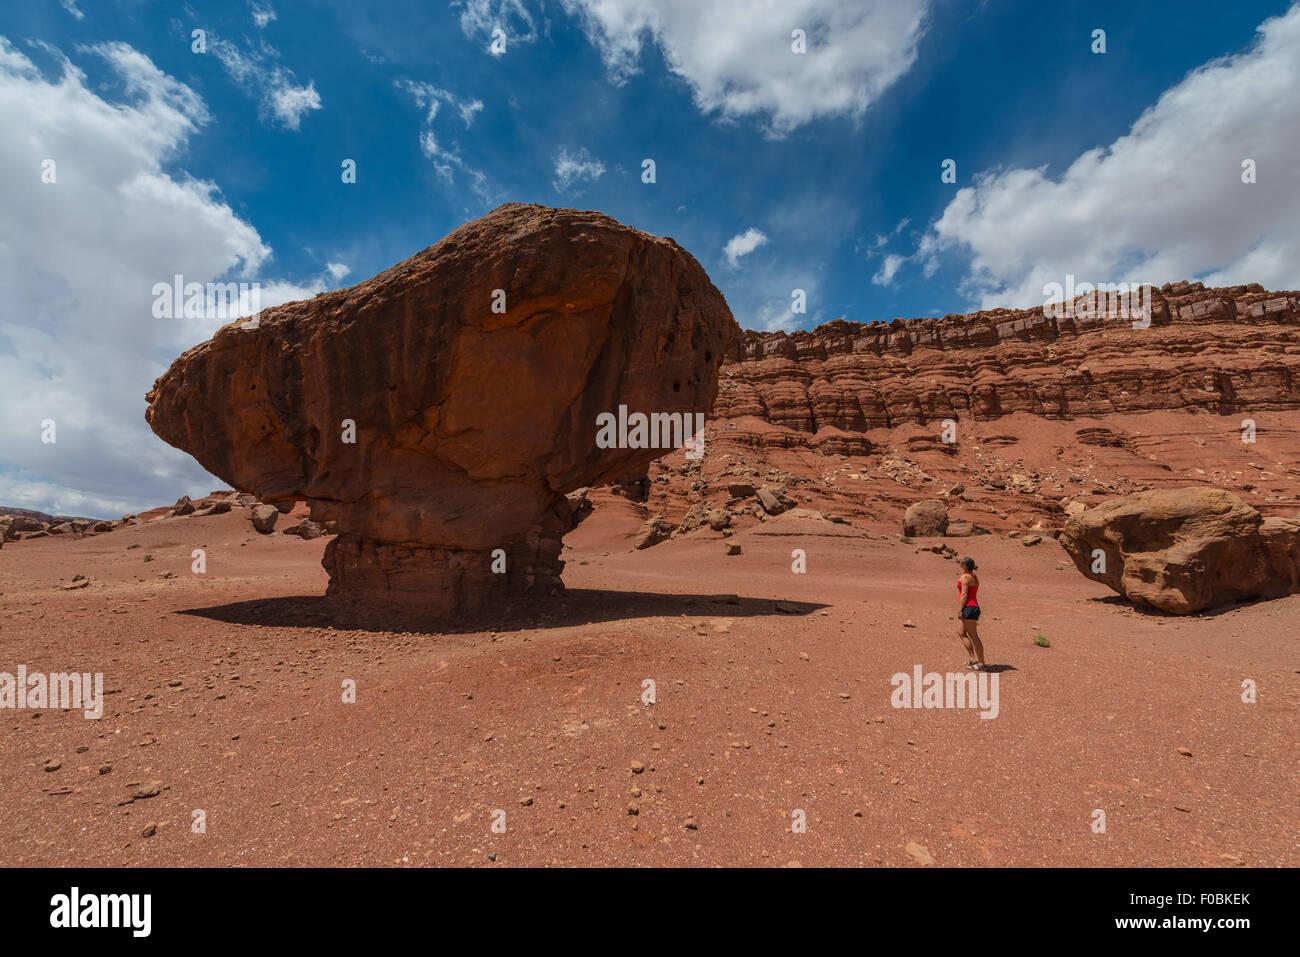 Balanced Rock Lees Ferry Coconino County Arizona Horizonal Composition - Stock Image